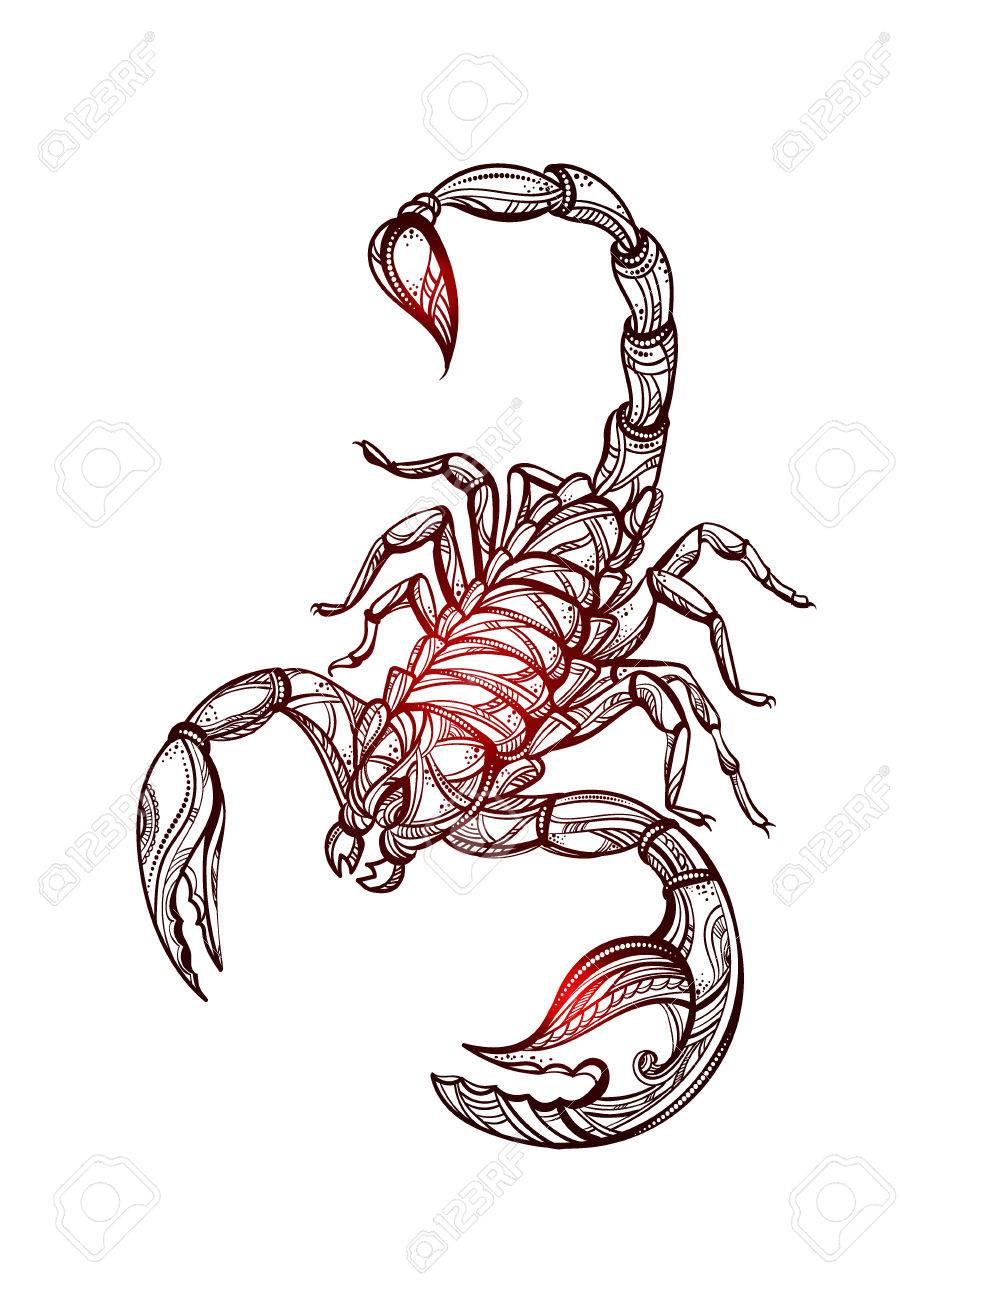 Escorpion Tatuaje vector escorpión tatuaje ilustraciones vectoriales, clip art